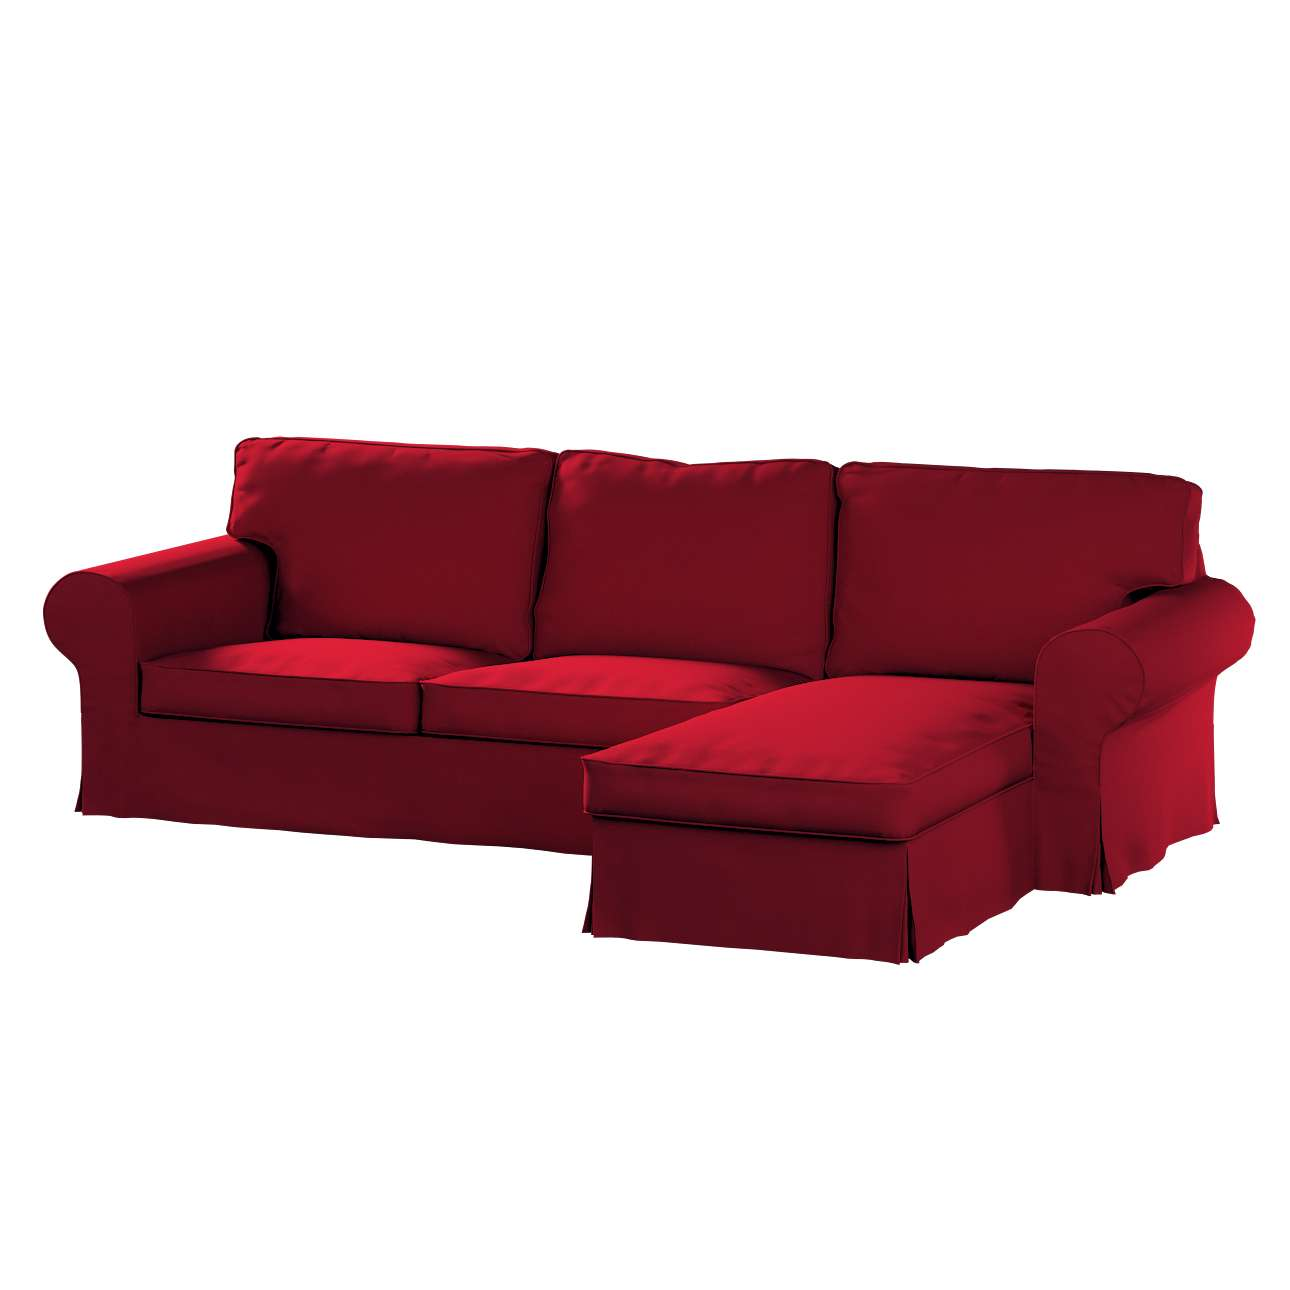 Ektorp 2-Sitzer Sofabezug mit Recamiere Ektorp 2-Sitzer Sofabezug mit Recamiere von der Kollektion Etna, Stoff: 705-60